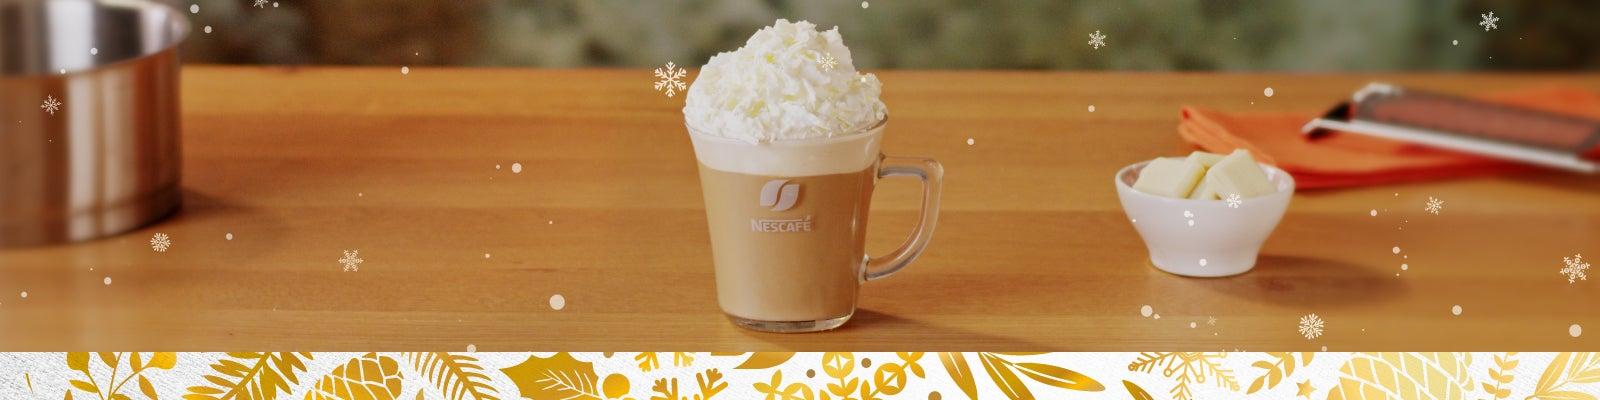 Nescafe White Mocha